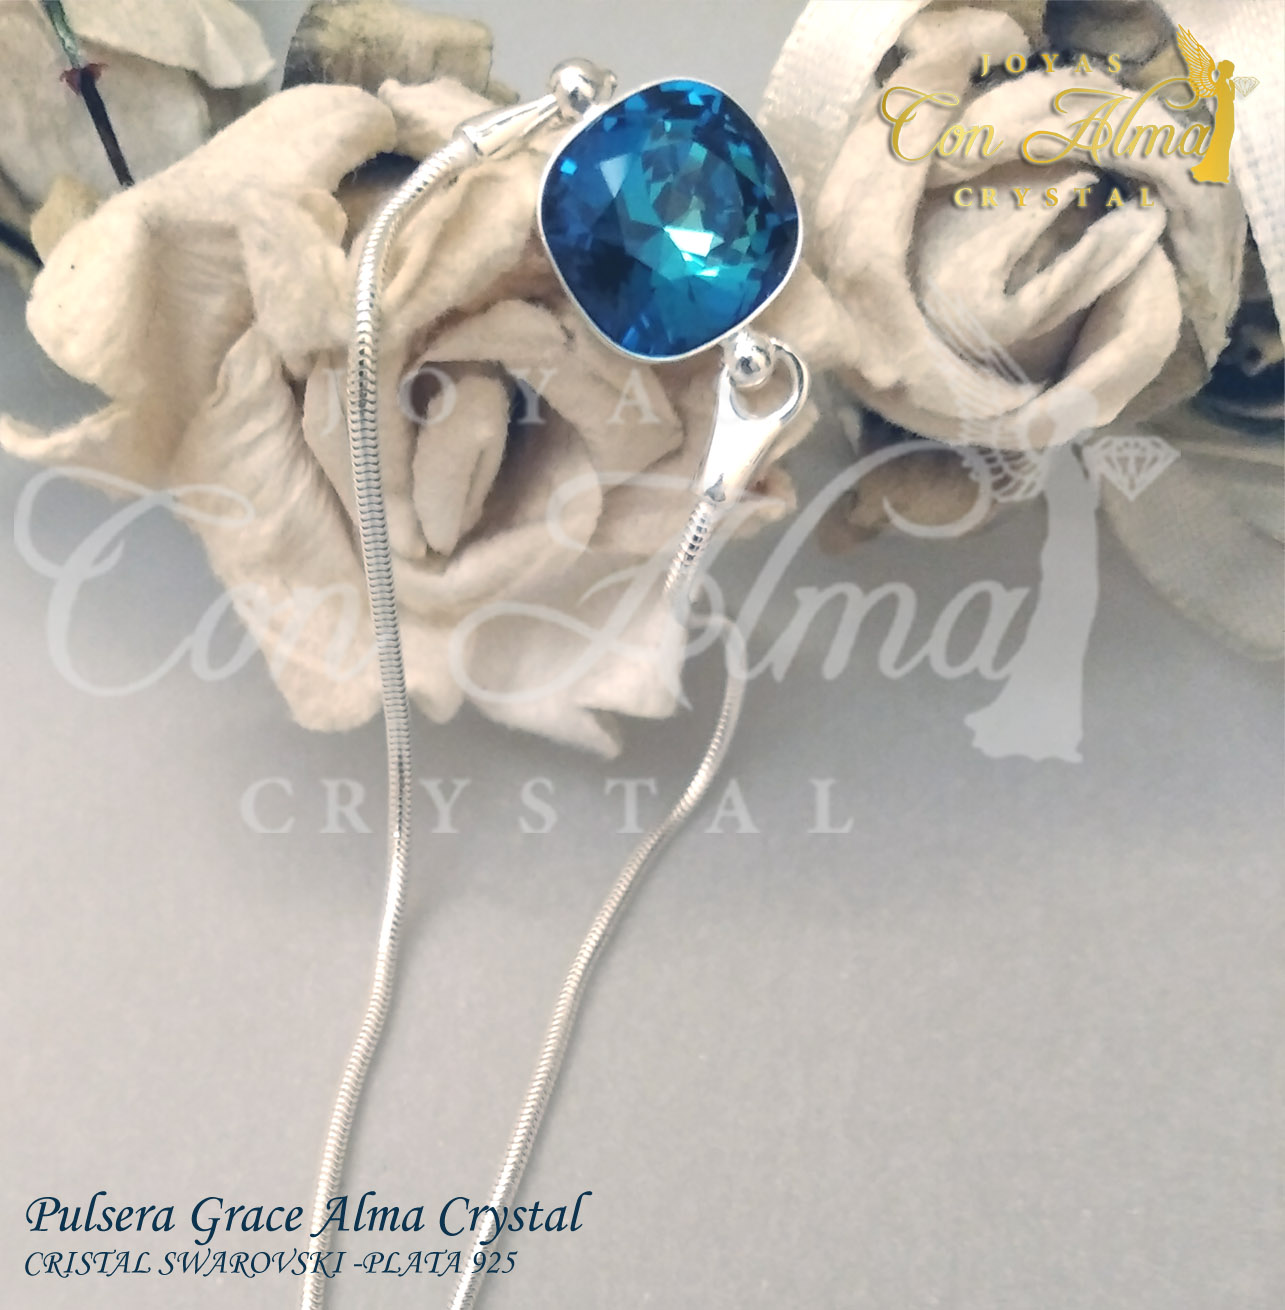 Pulsera Grace Alma Crystal